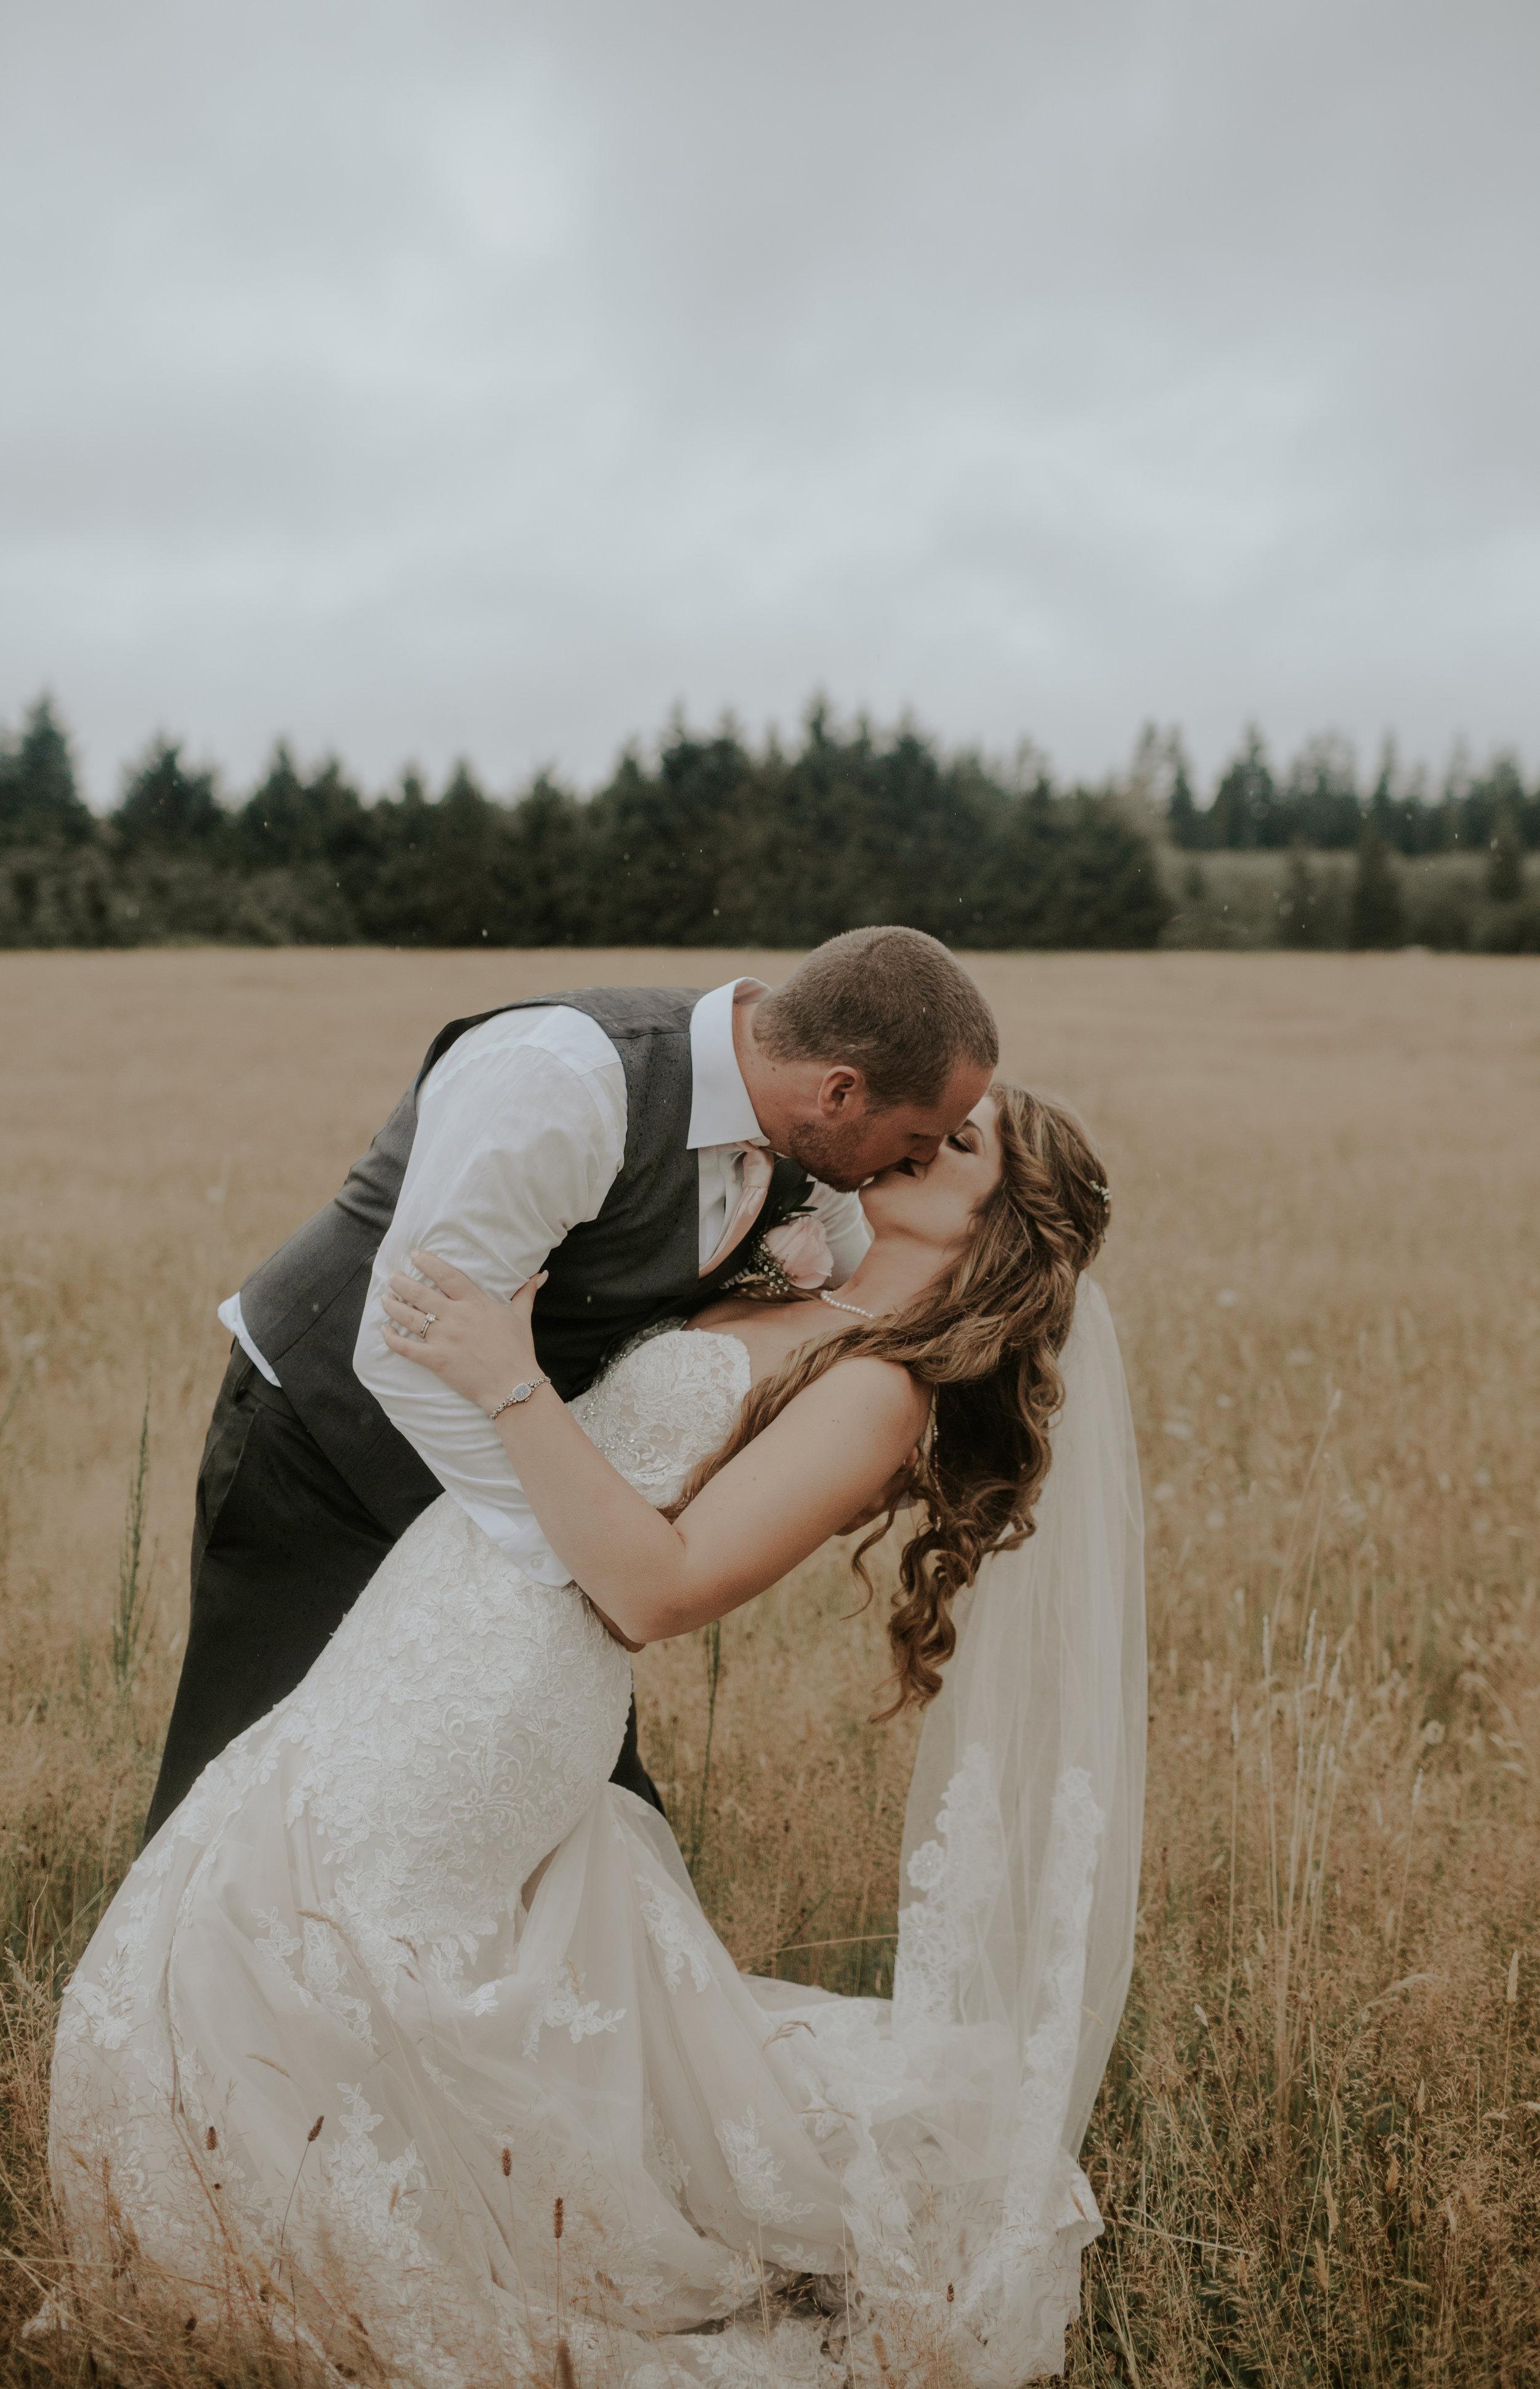 Olympic-Peninsula-Wedding-Photographer-PNW-Forks-Port-Angeles-Kayla-Dawn-Photography-engagement-Olympic-National-Park-148.jpg